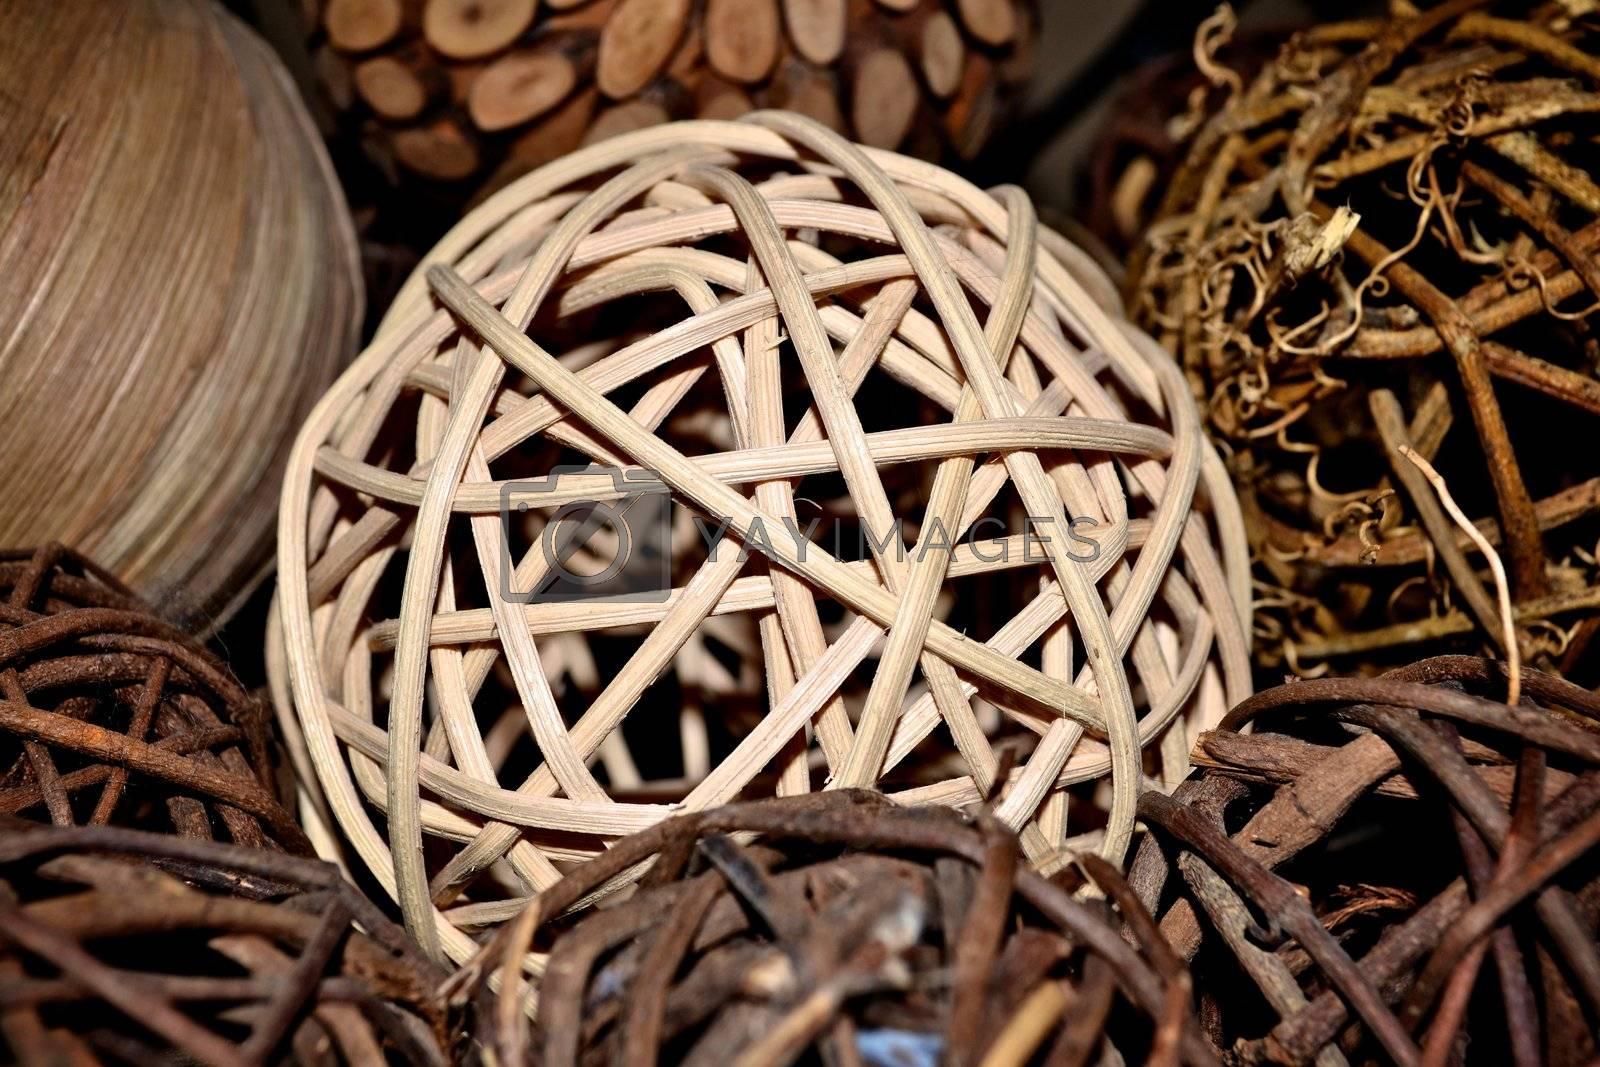 Deorative wicker stick balls in a basket.